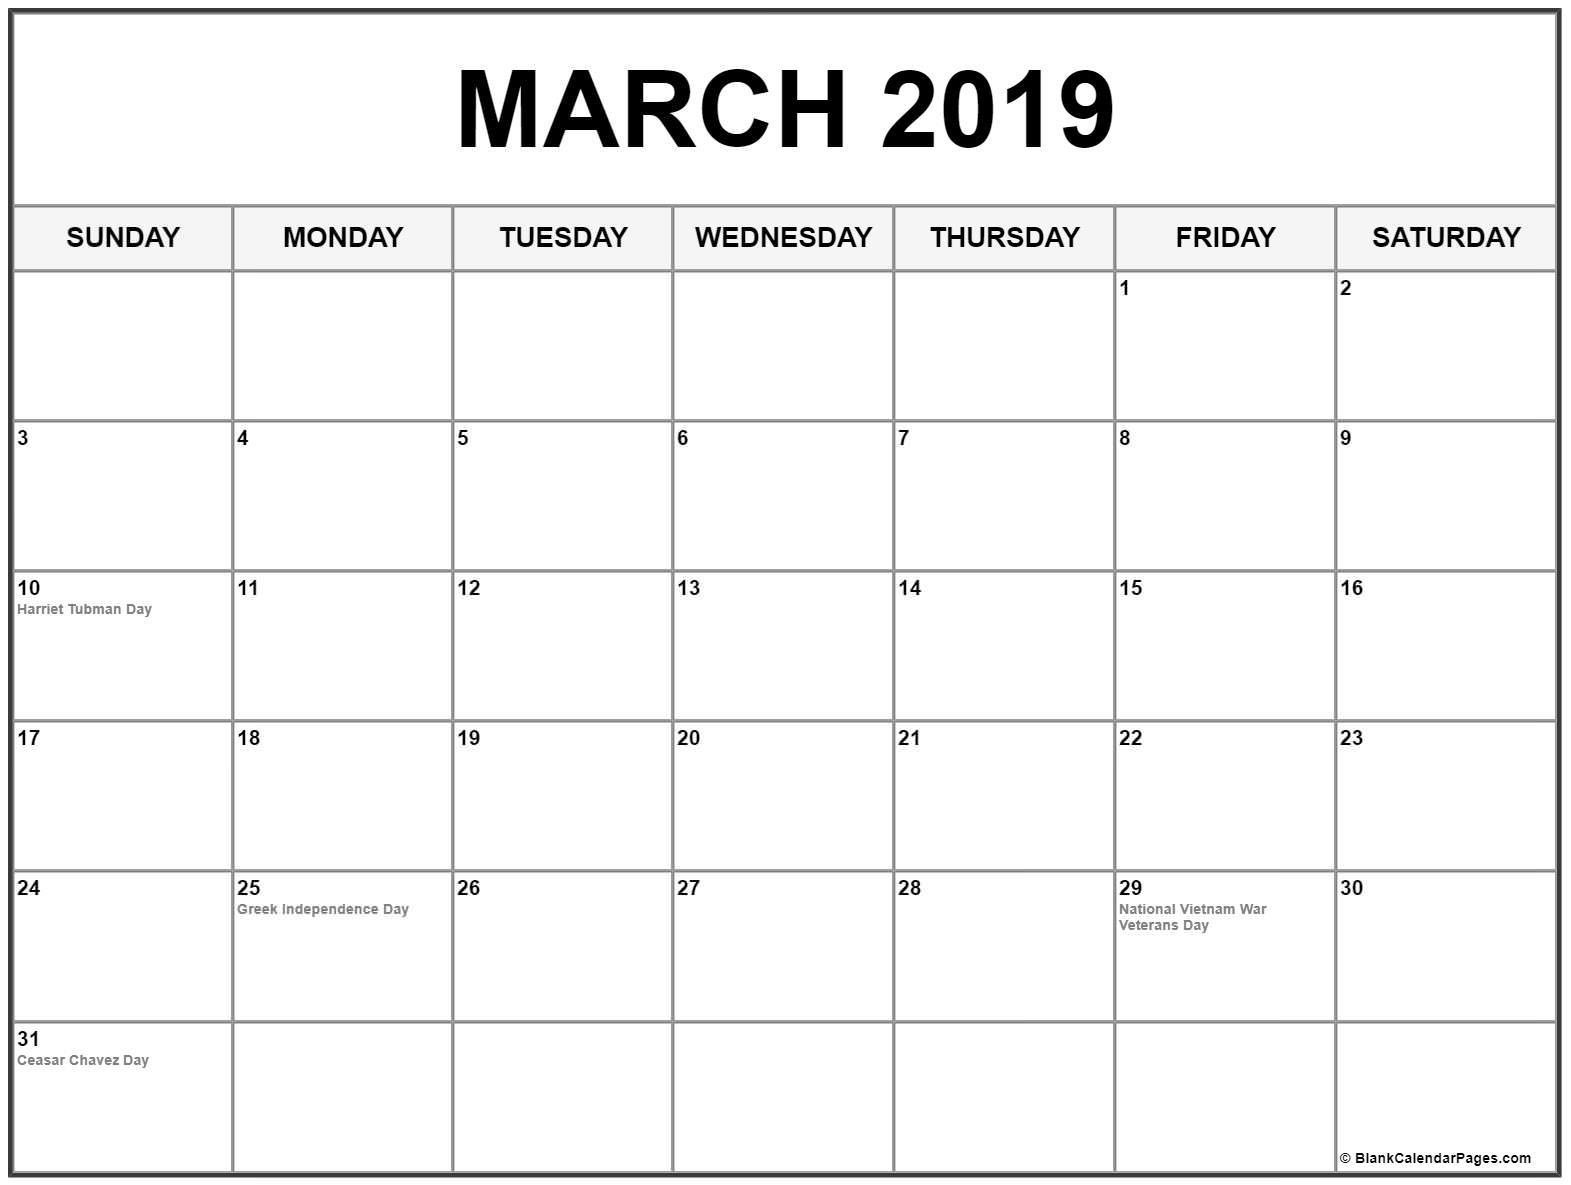 Editable March 2019 Calendar Printable Blank Template in